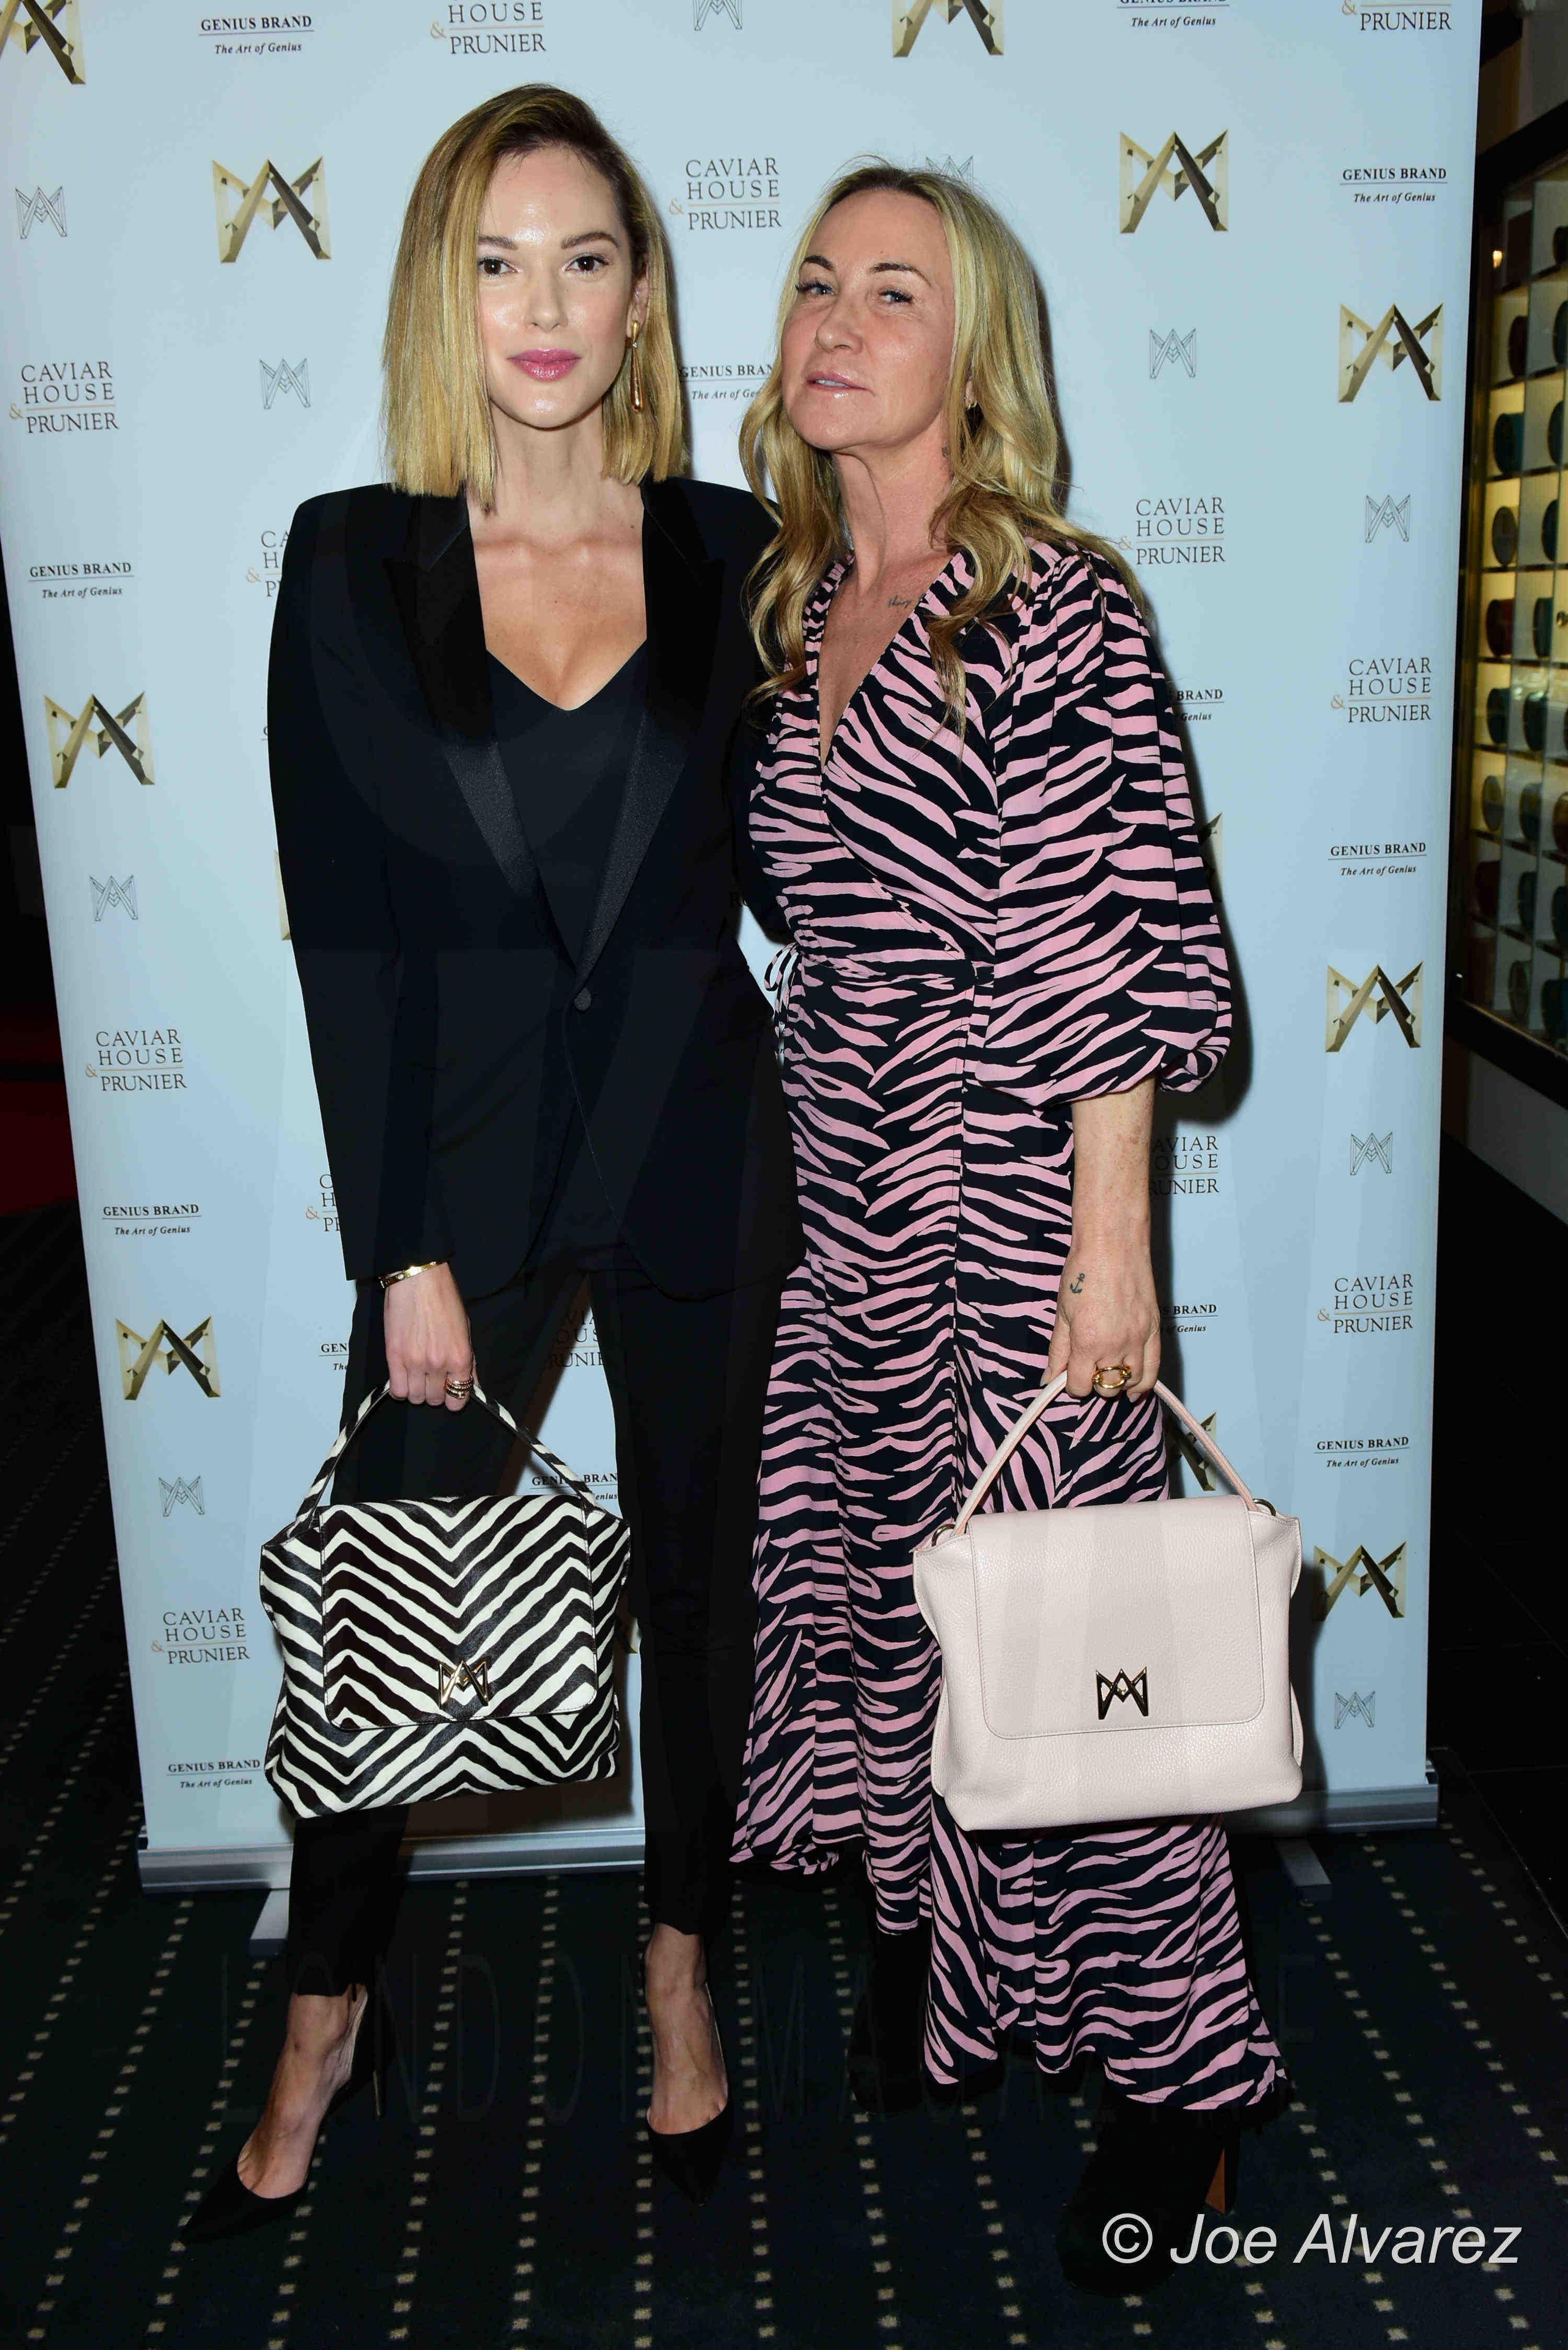 Anastasiia Masiutkina, Meg Matthews AMA bags launch party, Caviar House, Piccadilly, London. Copyright © JOE ALVAREZ